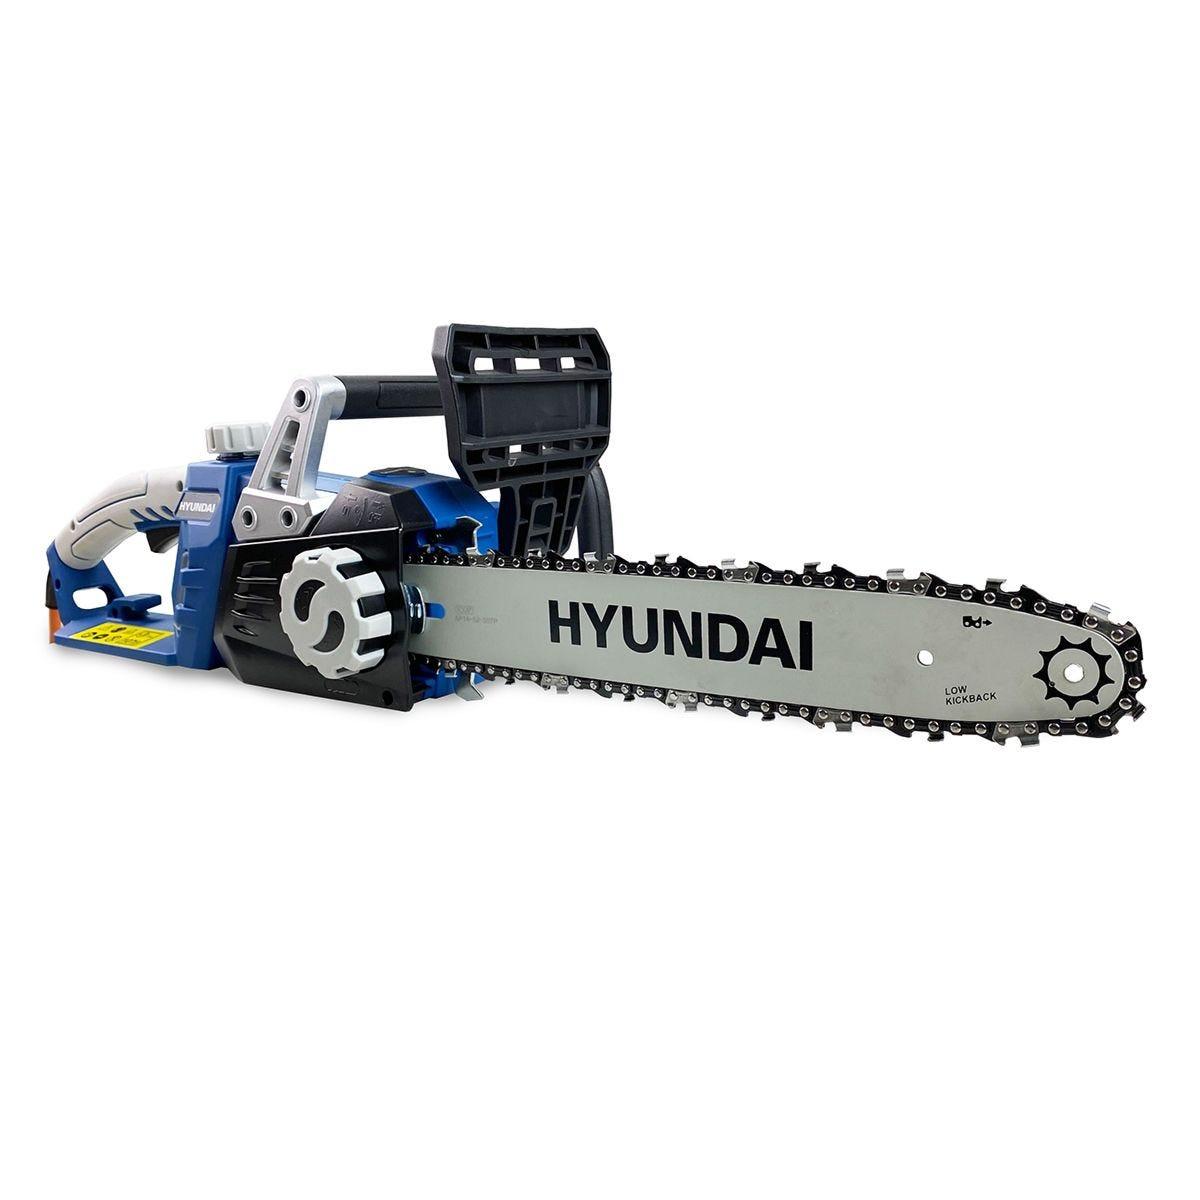 Hyundai HYC1600E 14